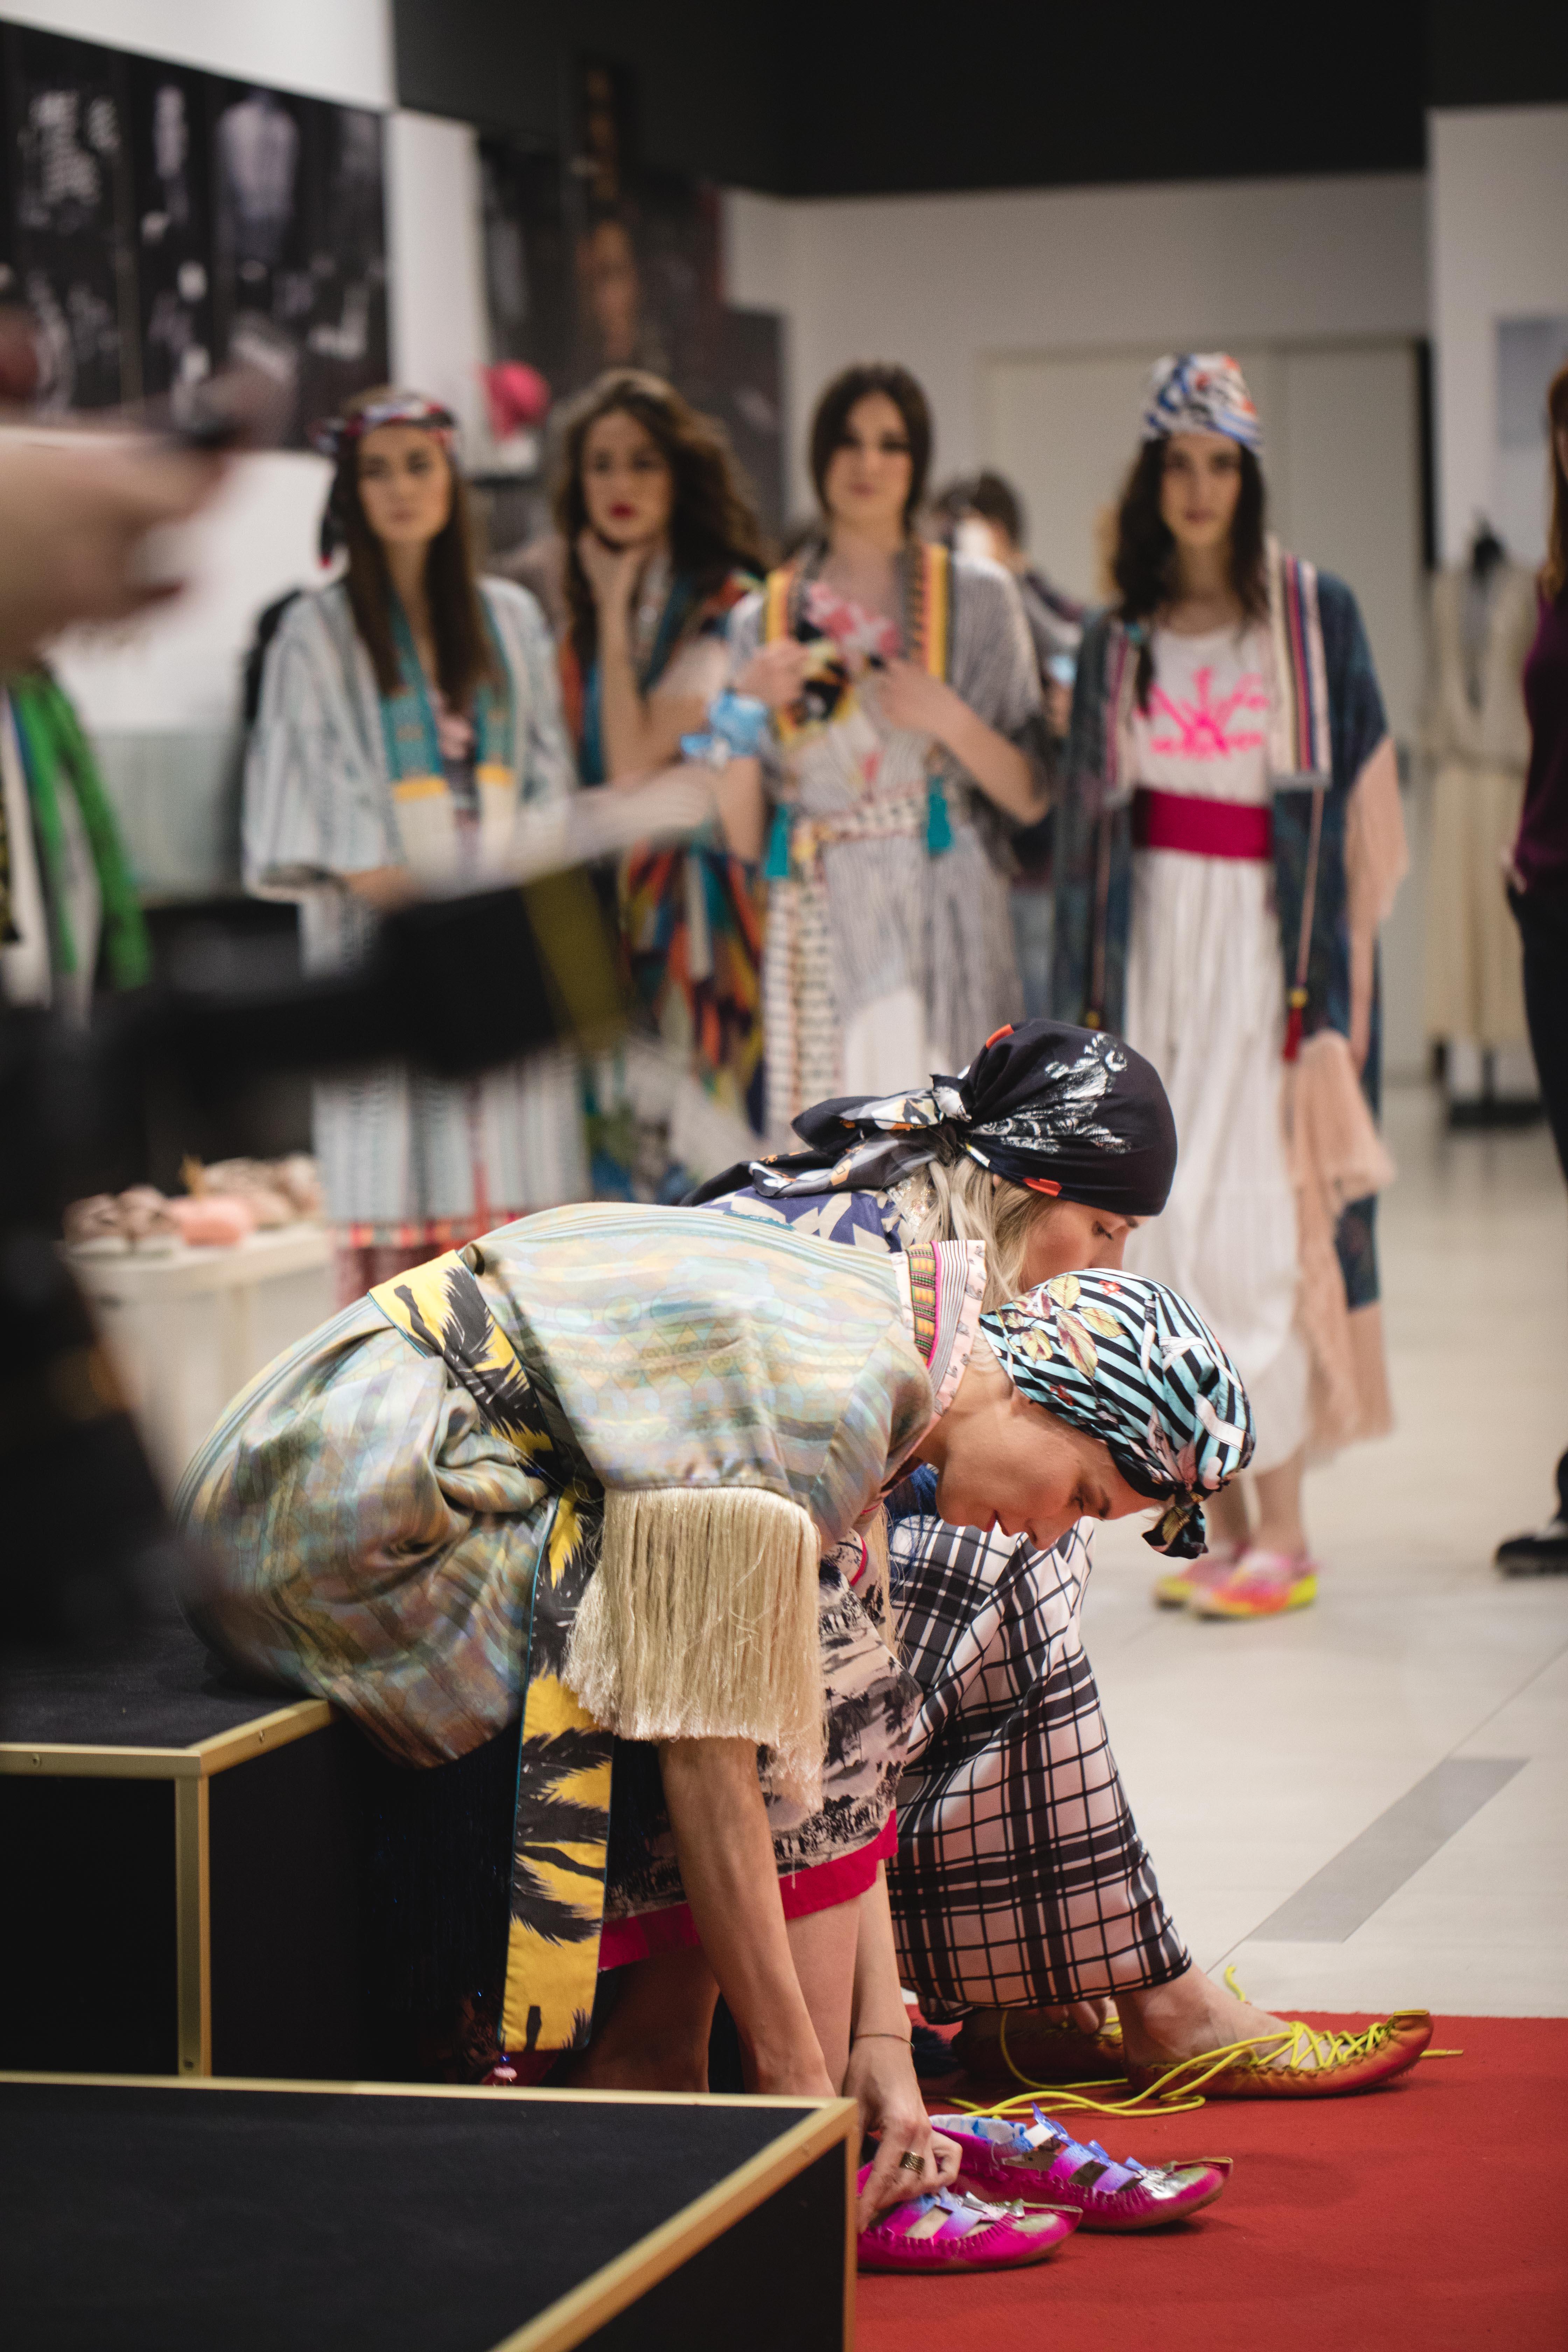 Andrej Mihailovic Gerila 12 Perwoll Fashion Week: Otvorena izložba A New Beginning